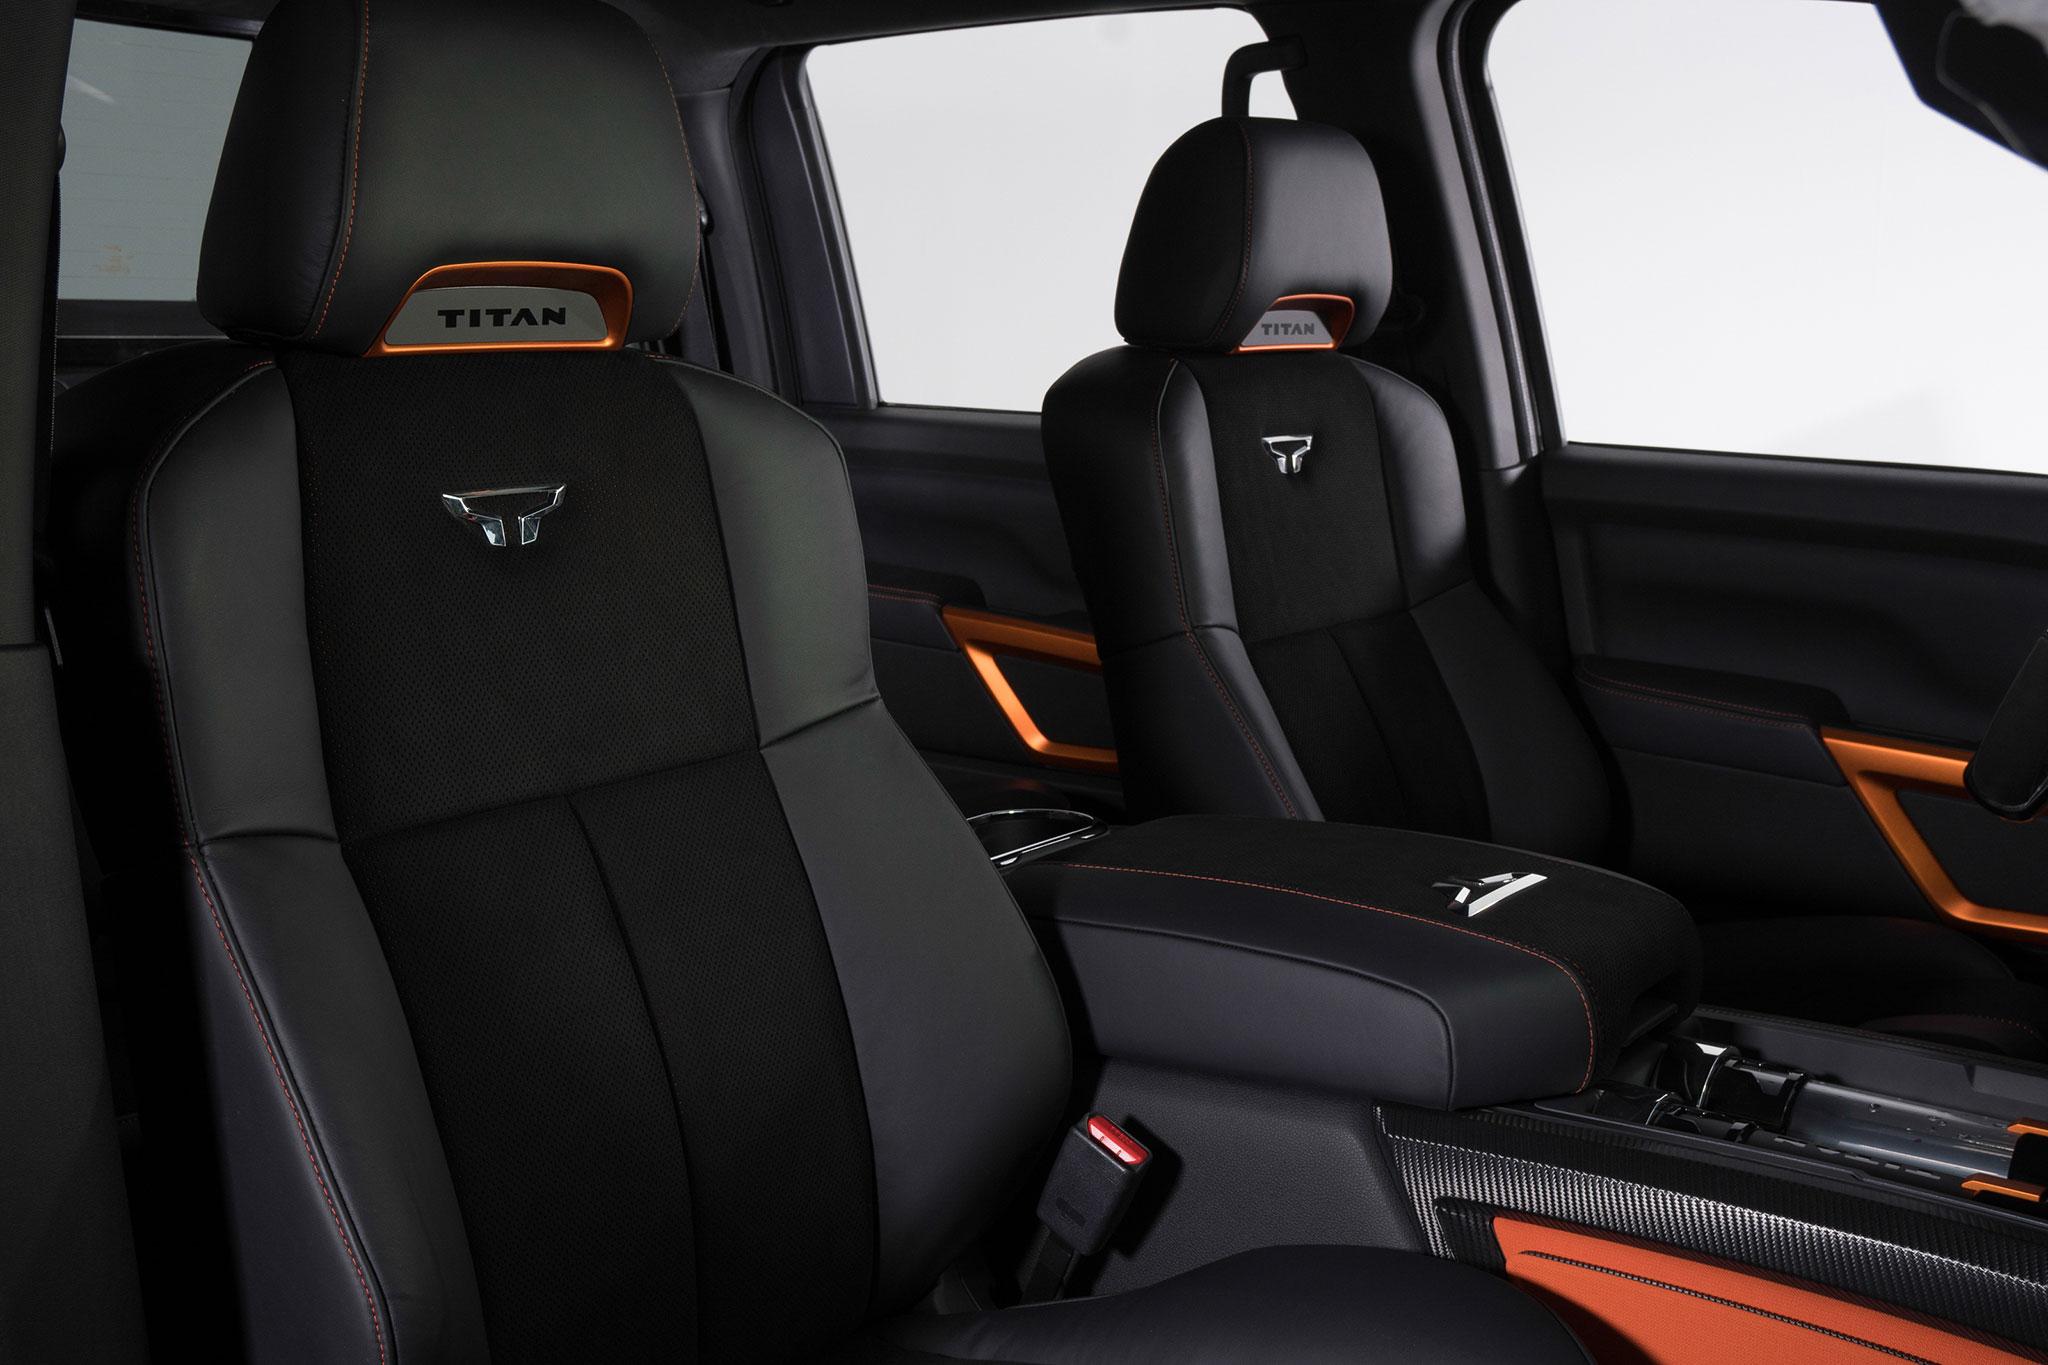 Nissan Titan Warrior concept seats